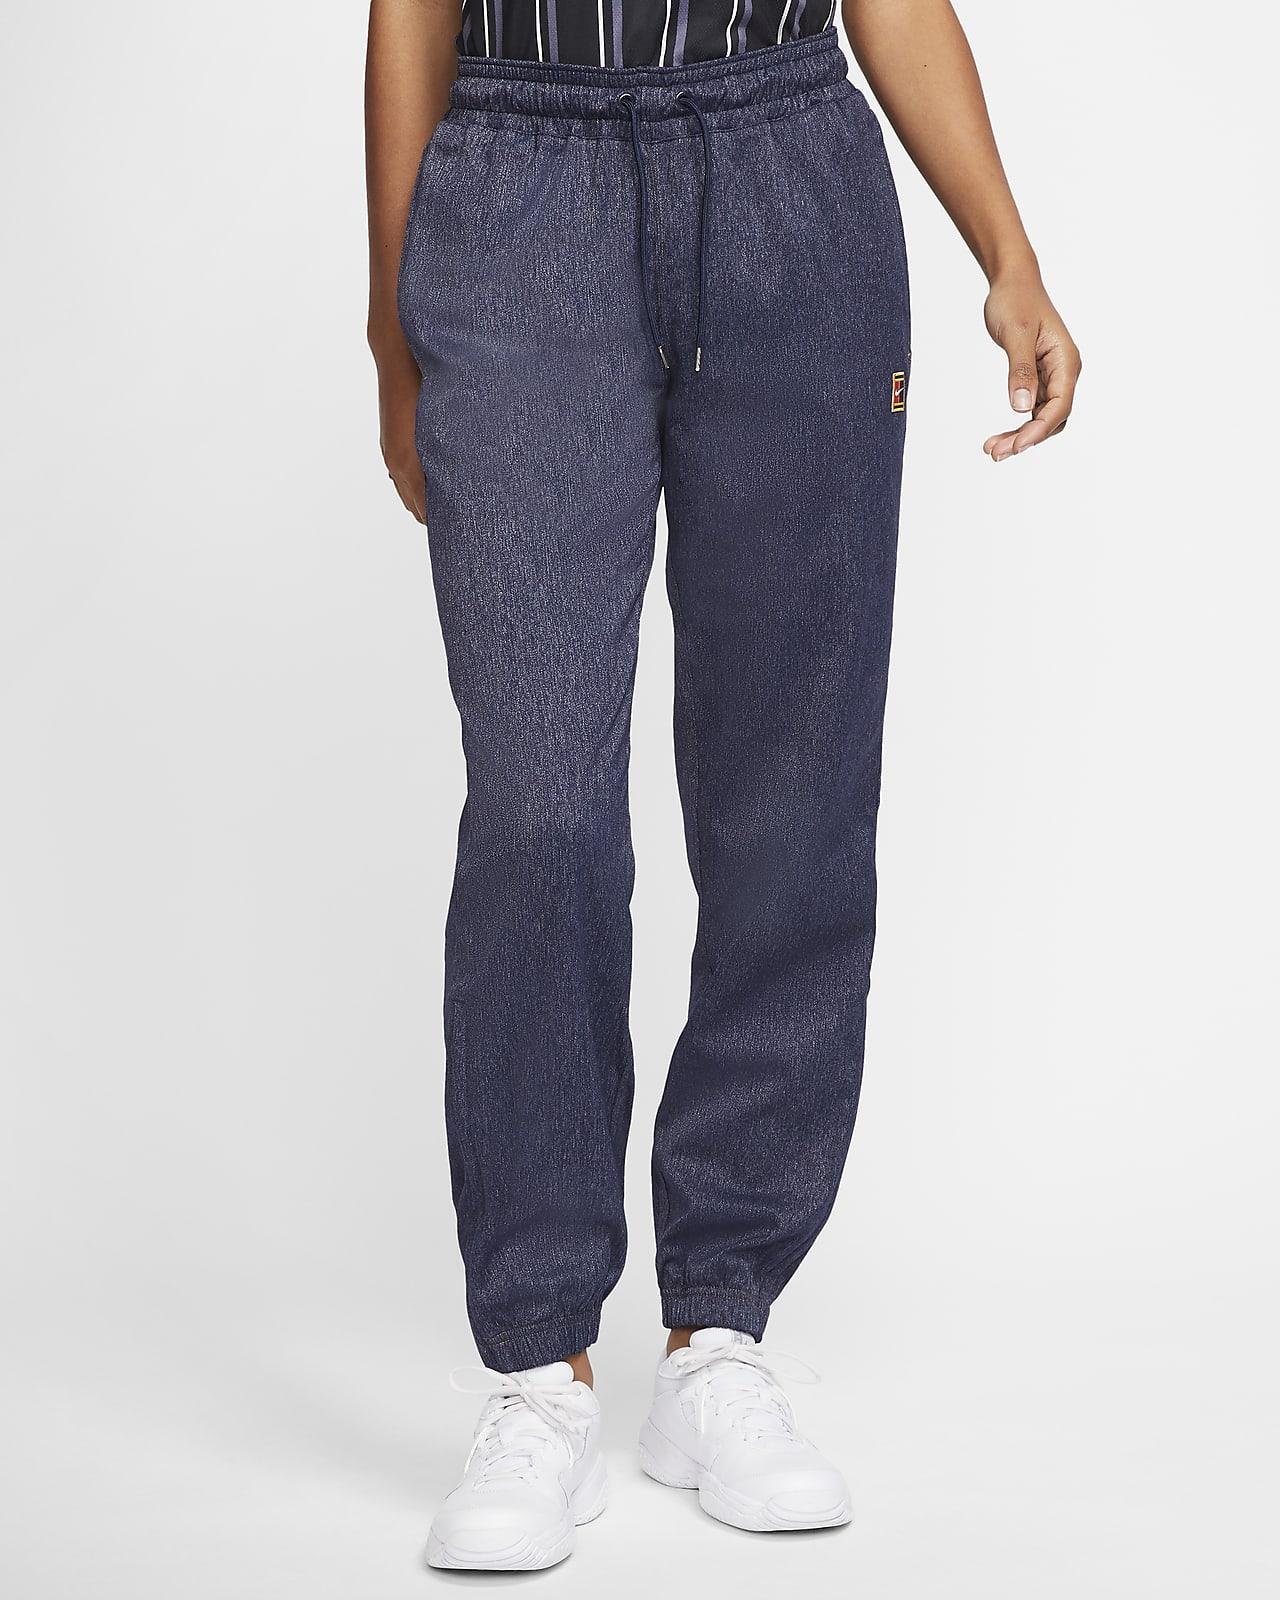 Pantalones De Tenis Para Mujer Nikecourt Nike Com